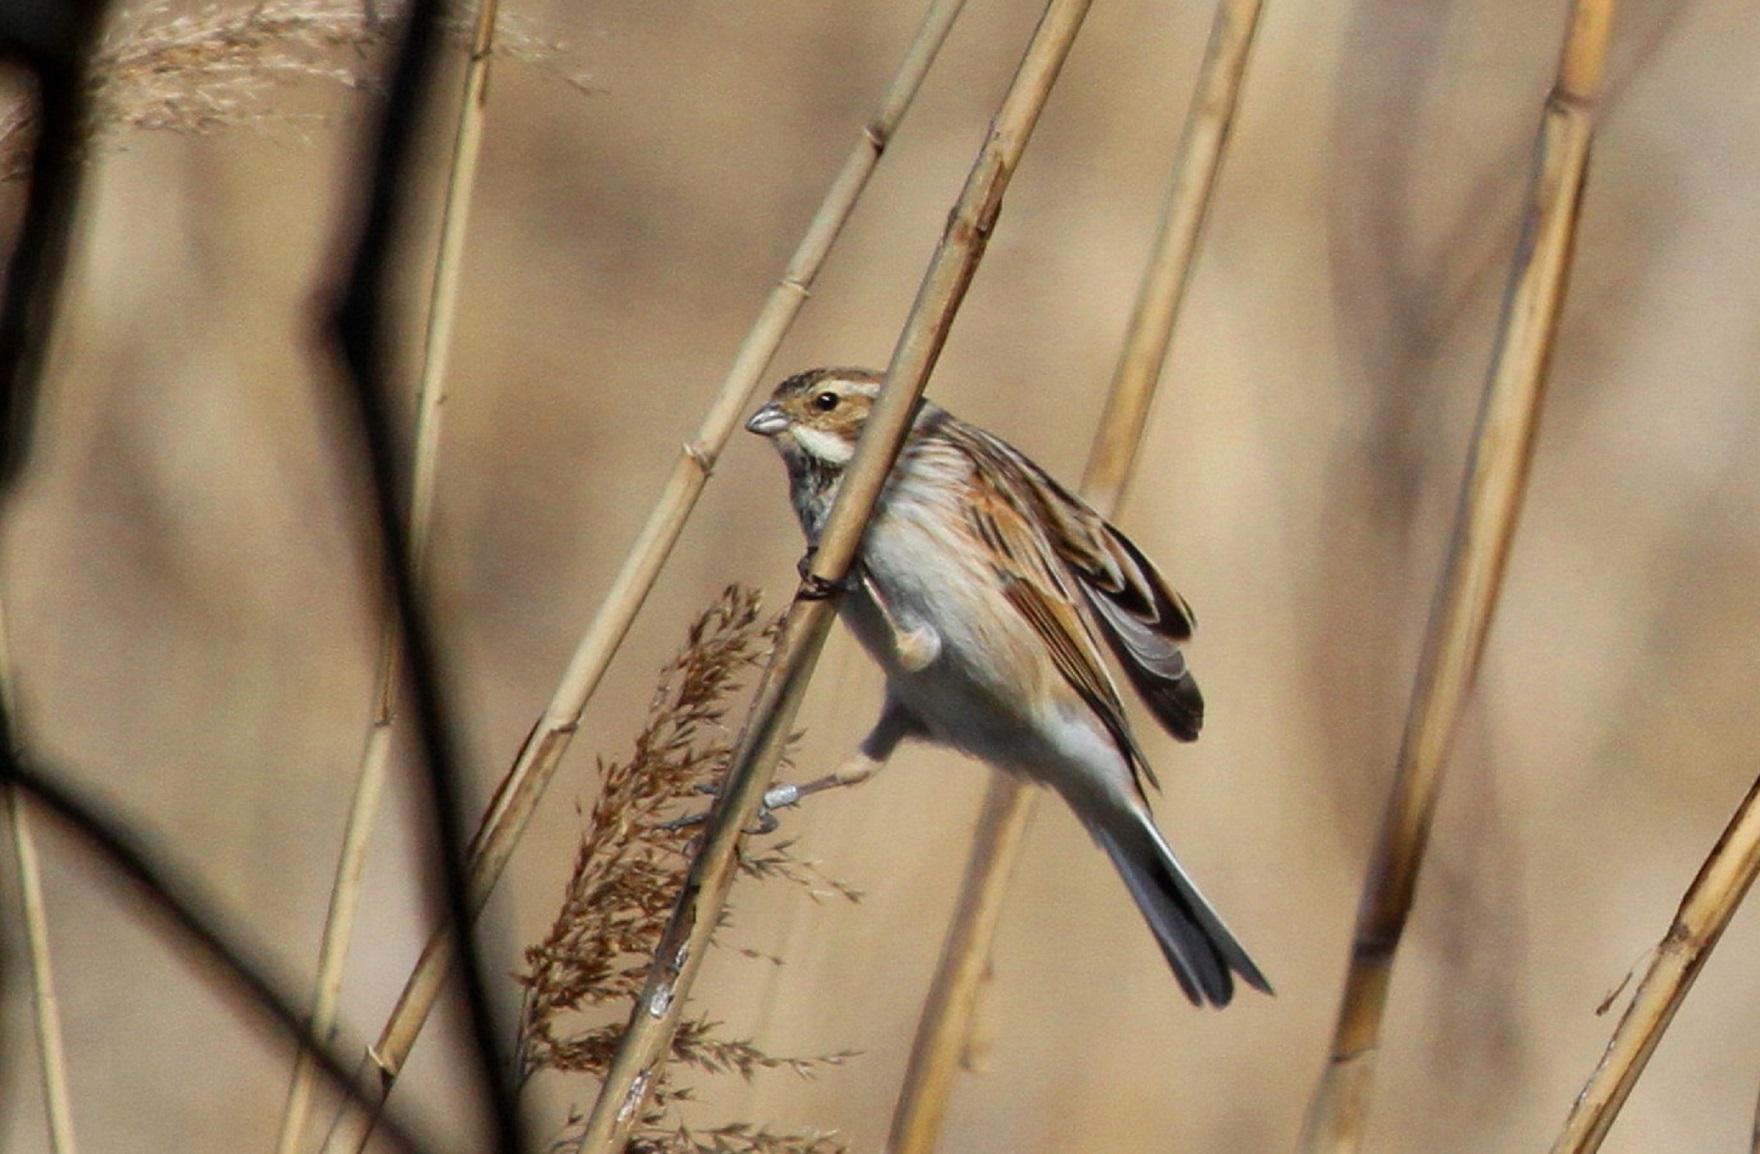 MFで出会えた、冬鳥オオジュリン冬羽から夏羽に変わりつつ_f0239515_21585495.jpg